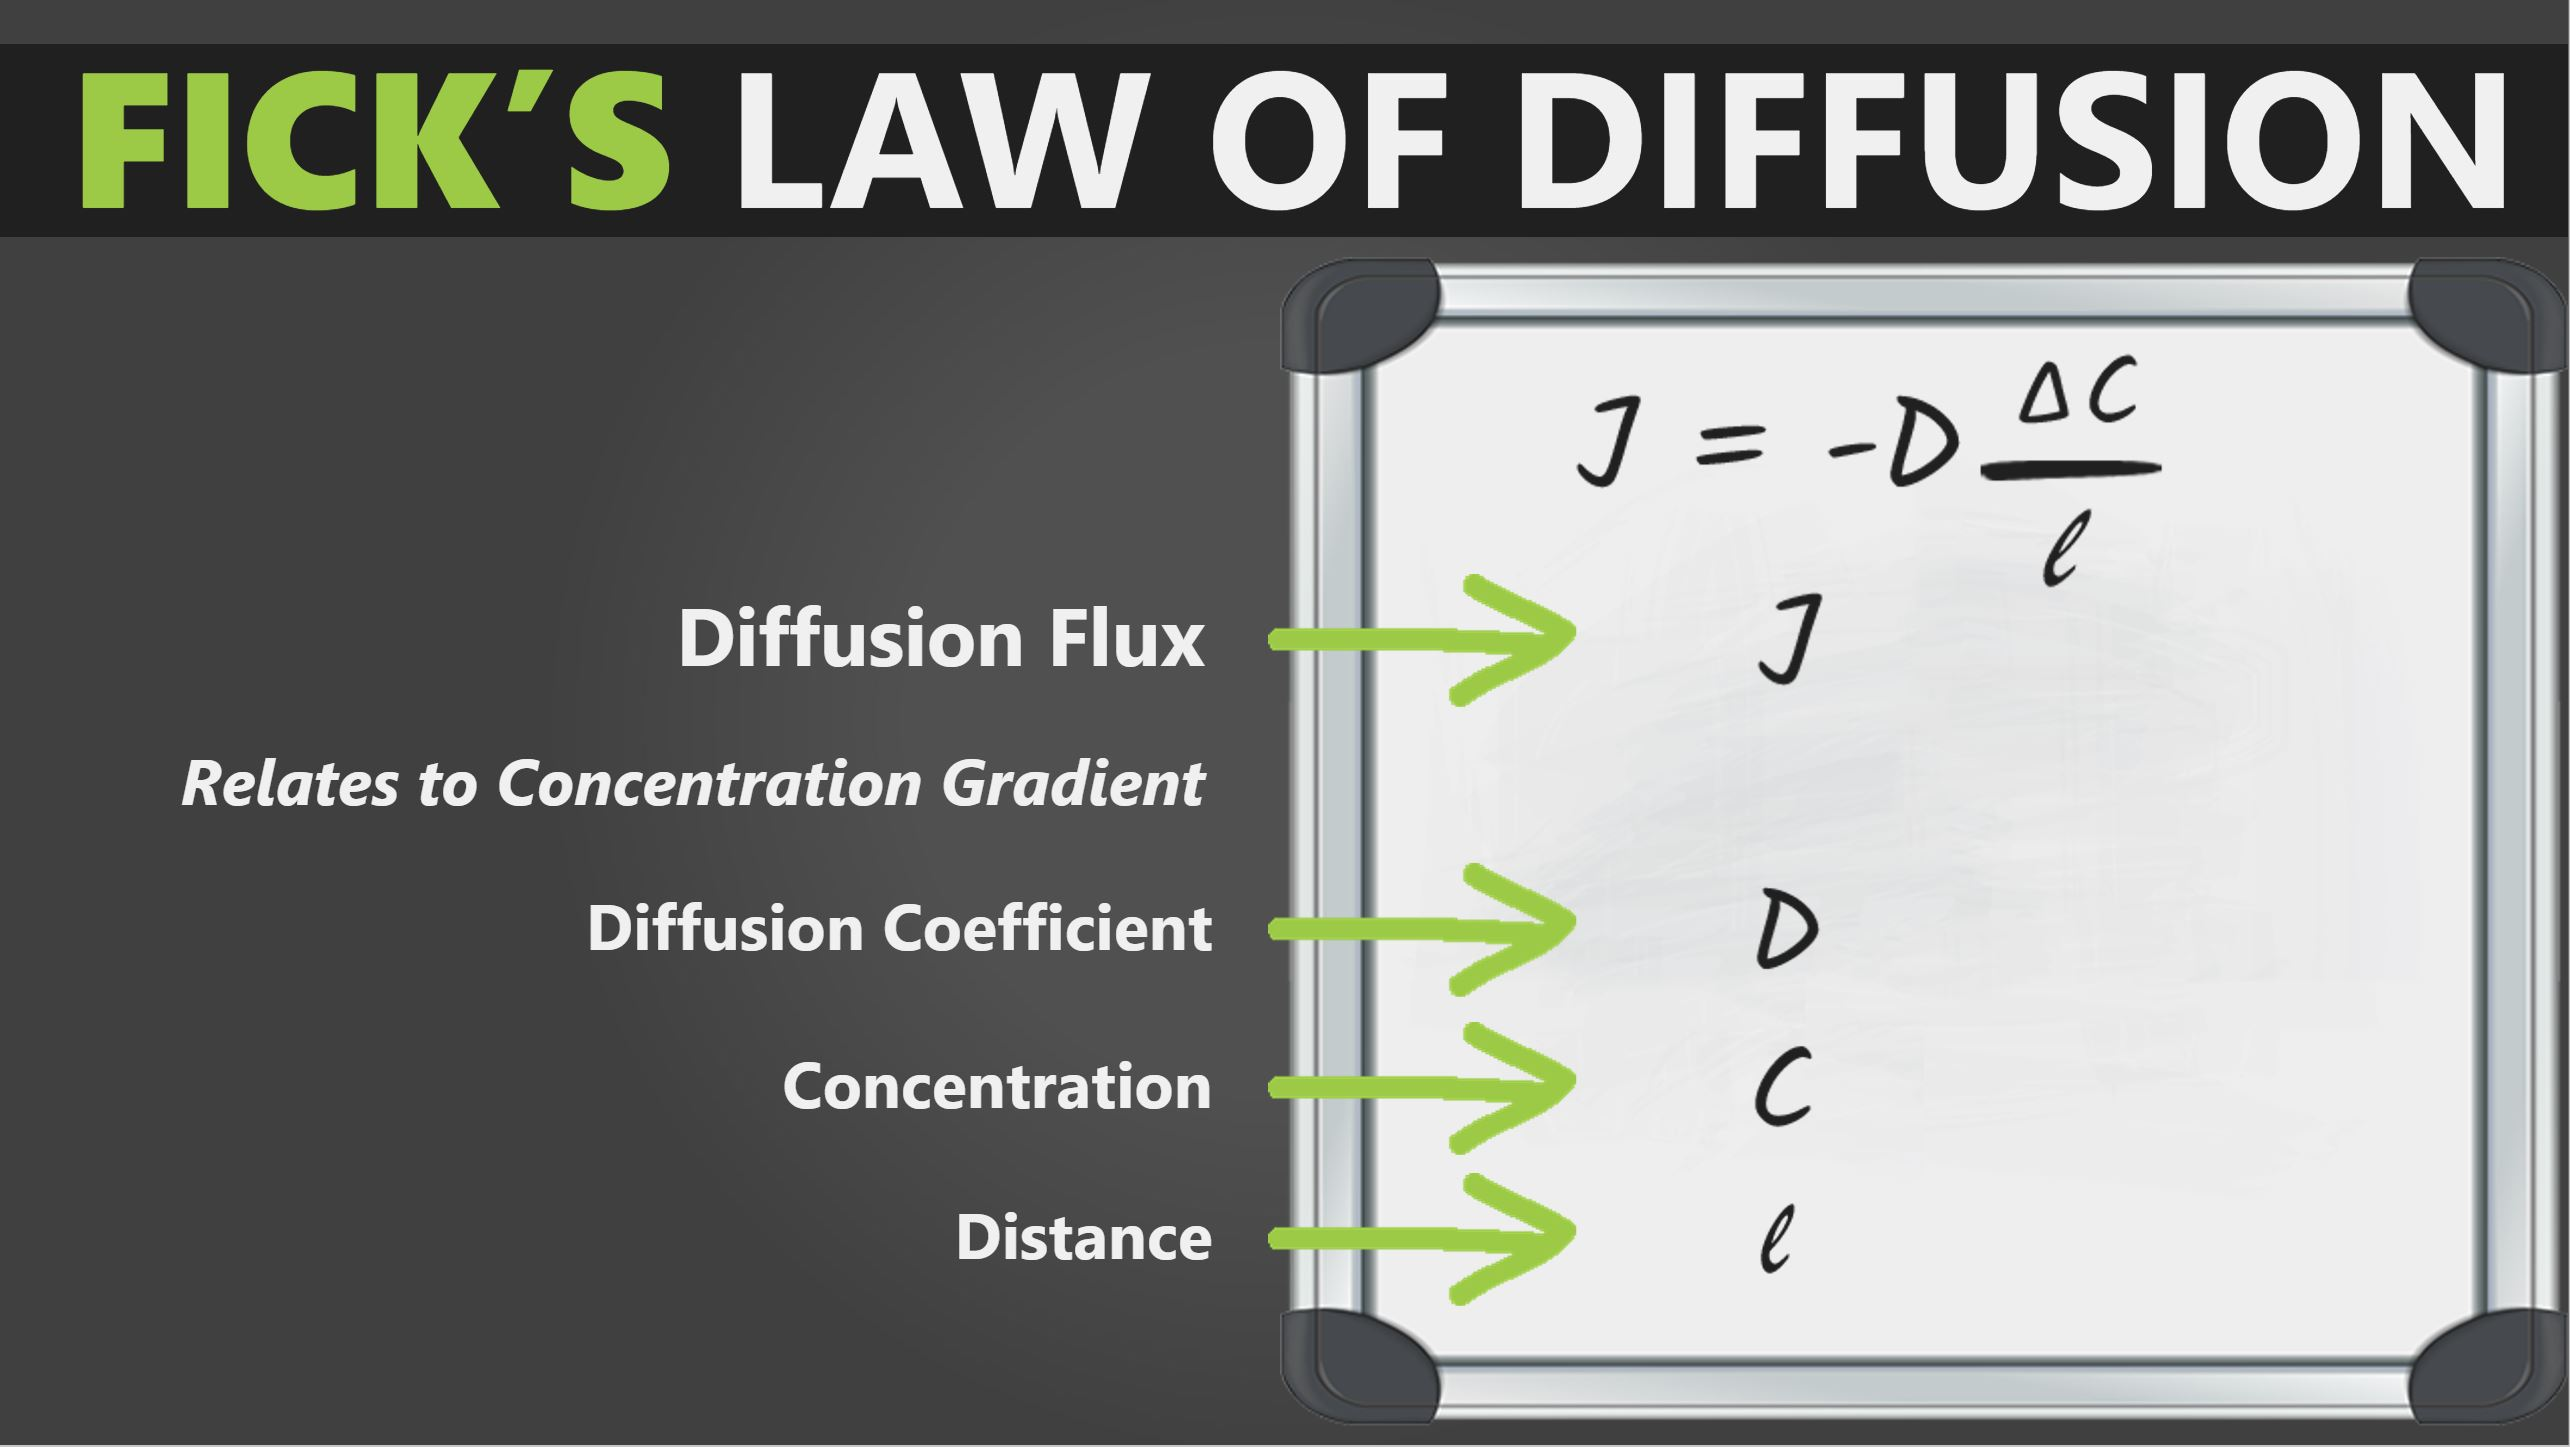 Ficks Law of Diffusion